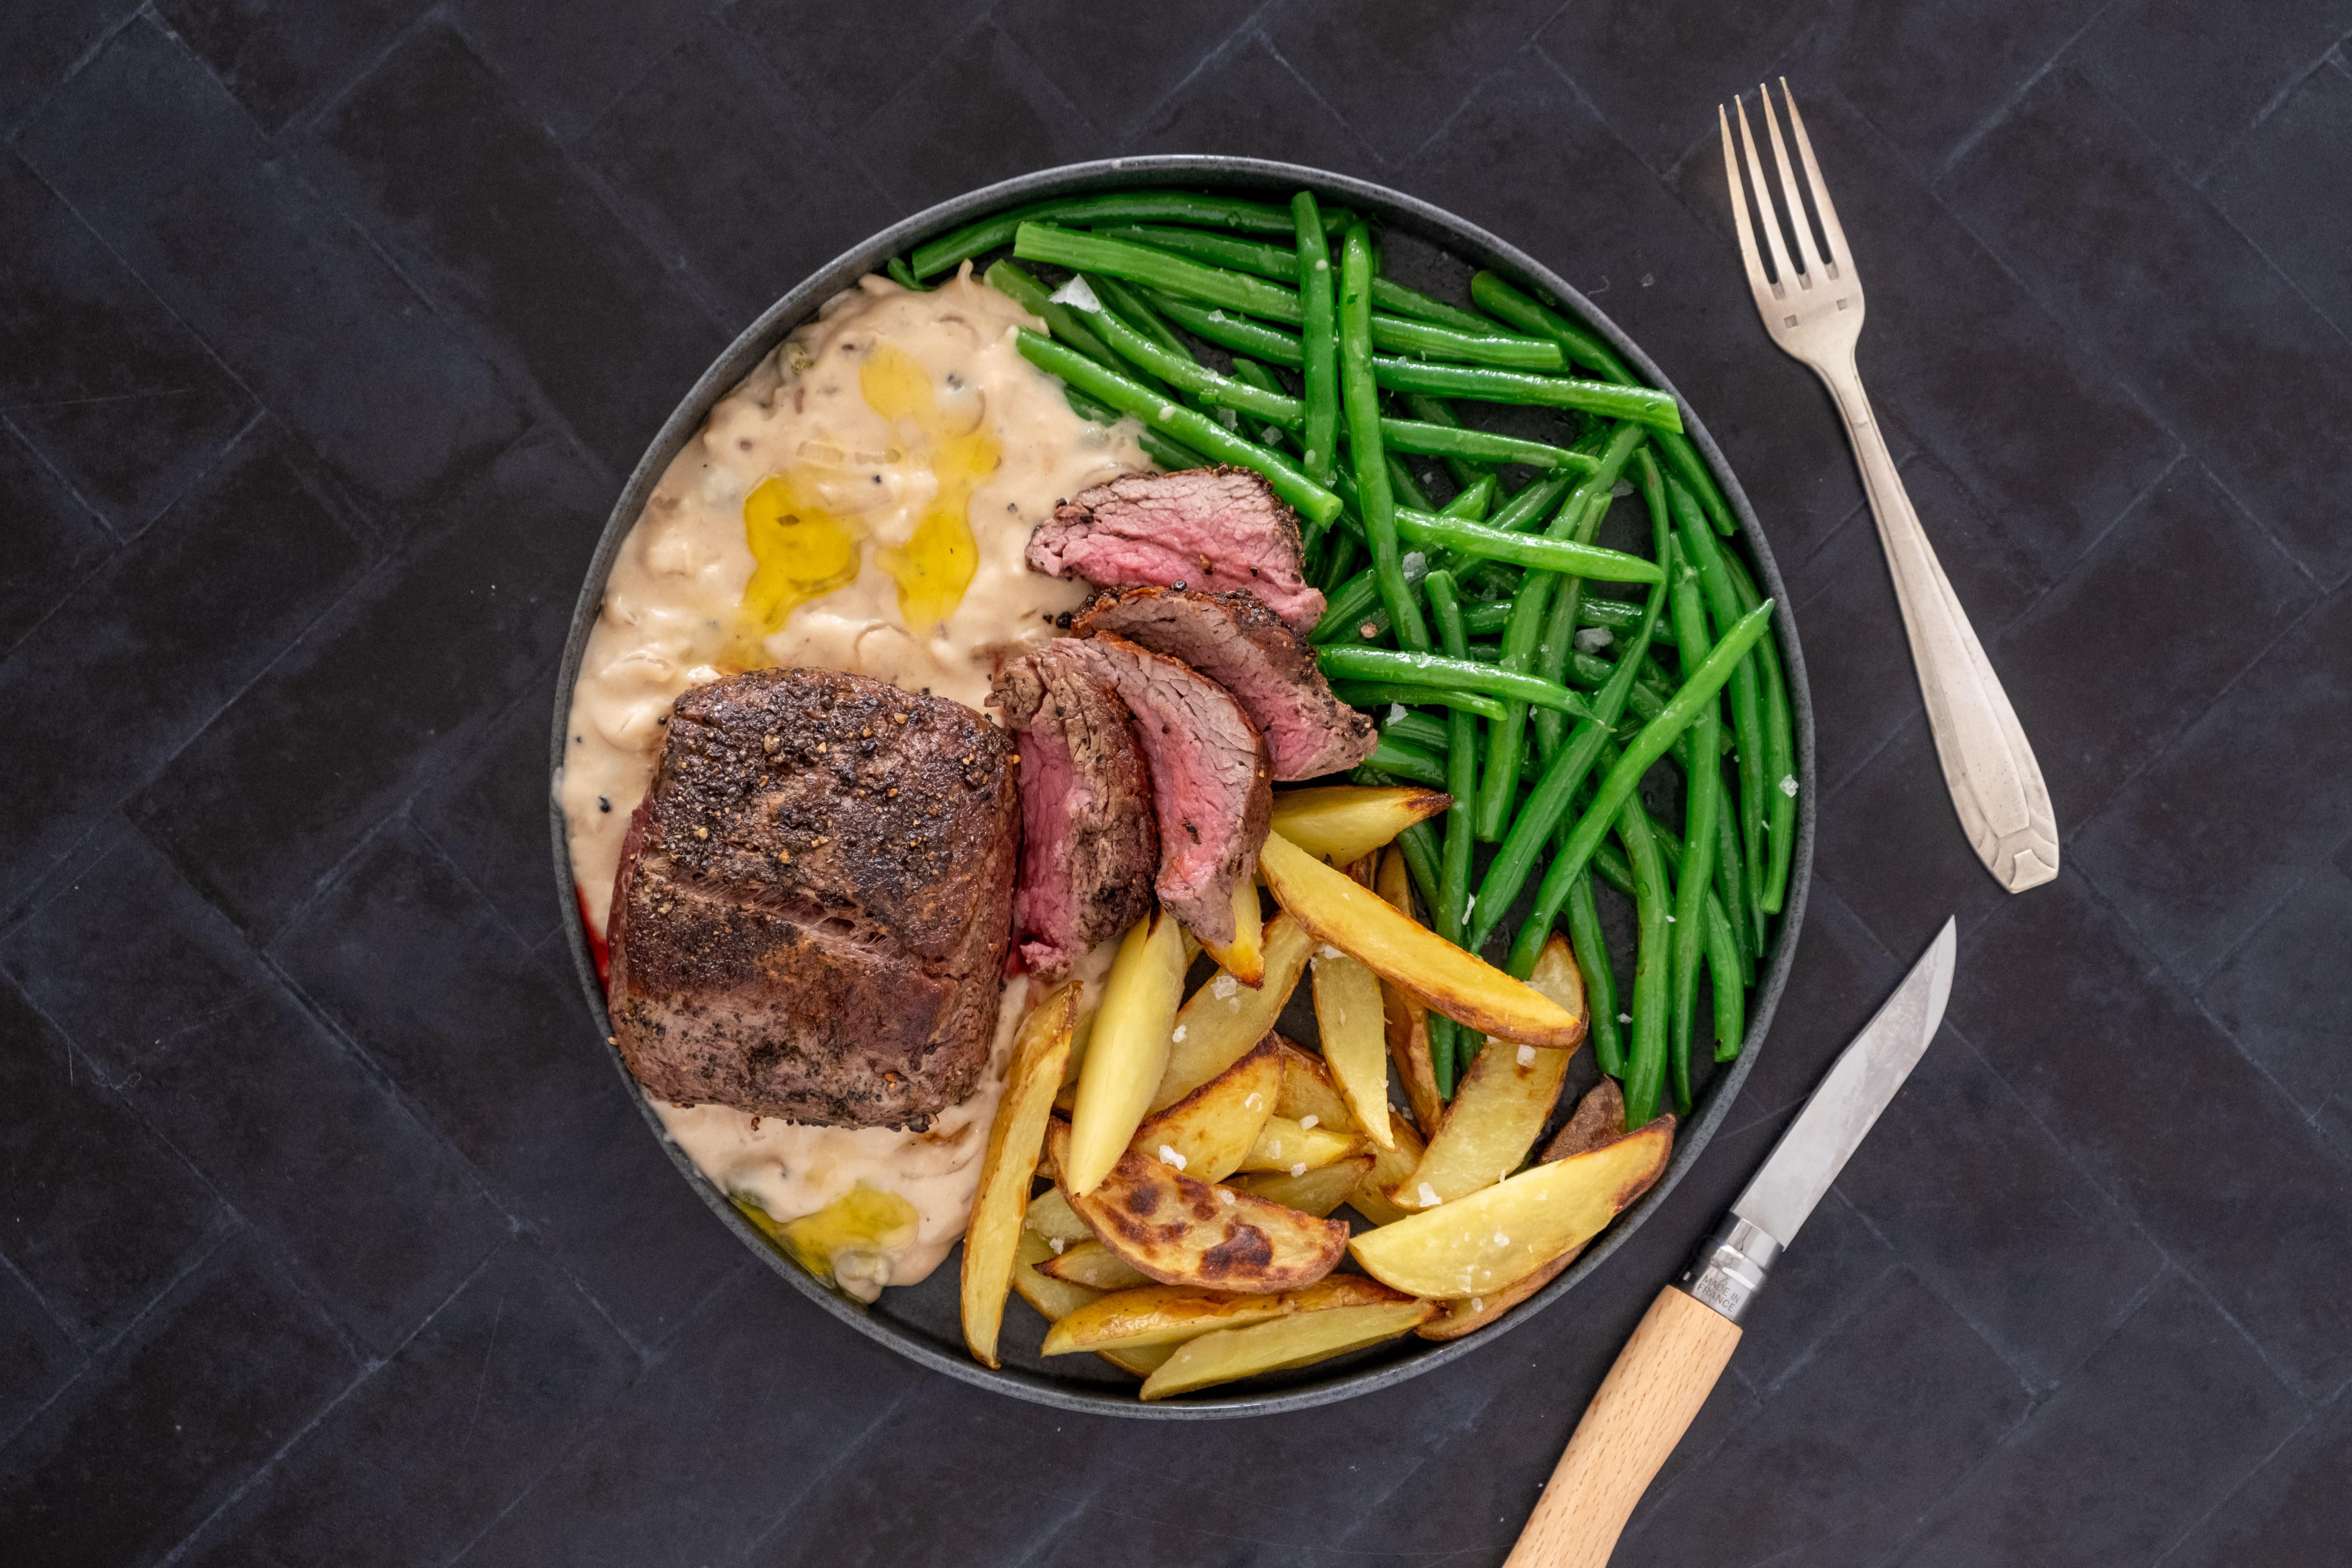 Fillet Steak au Poivre with Green Beans